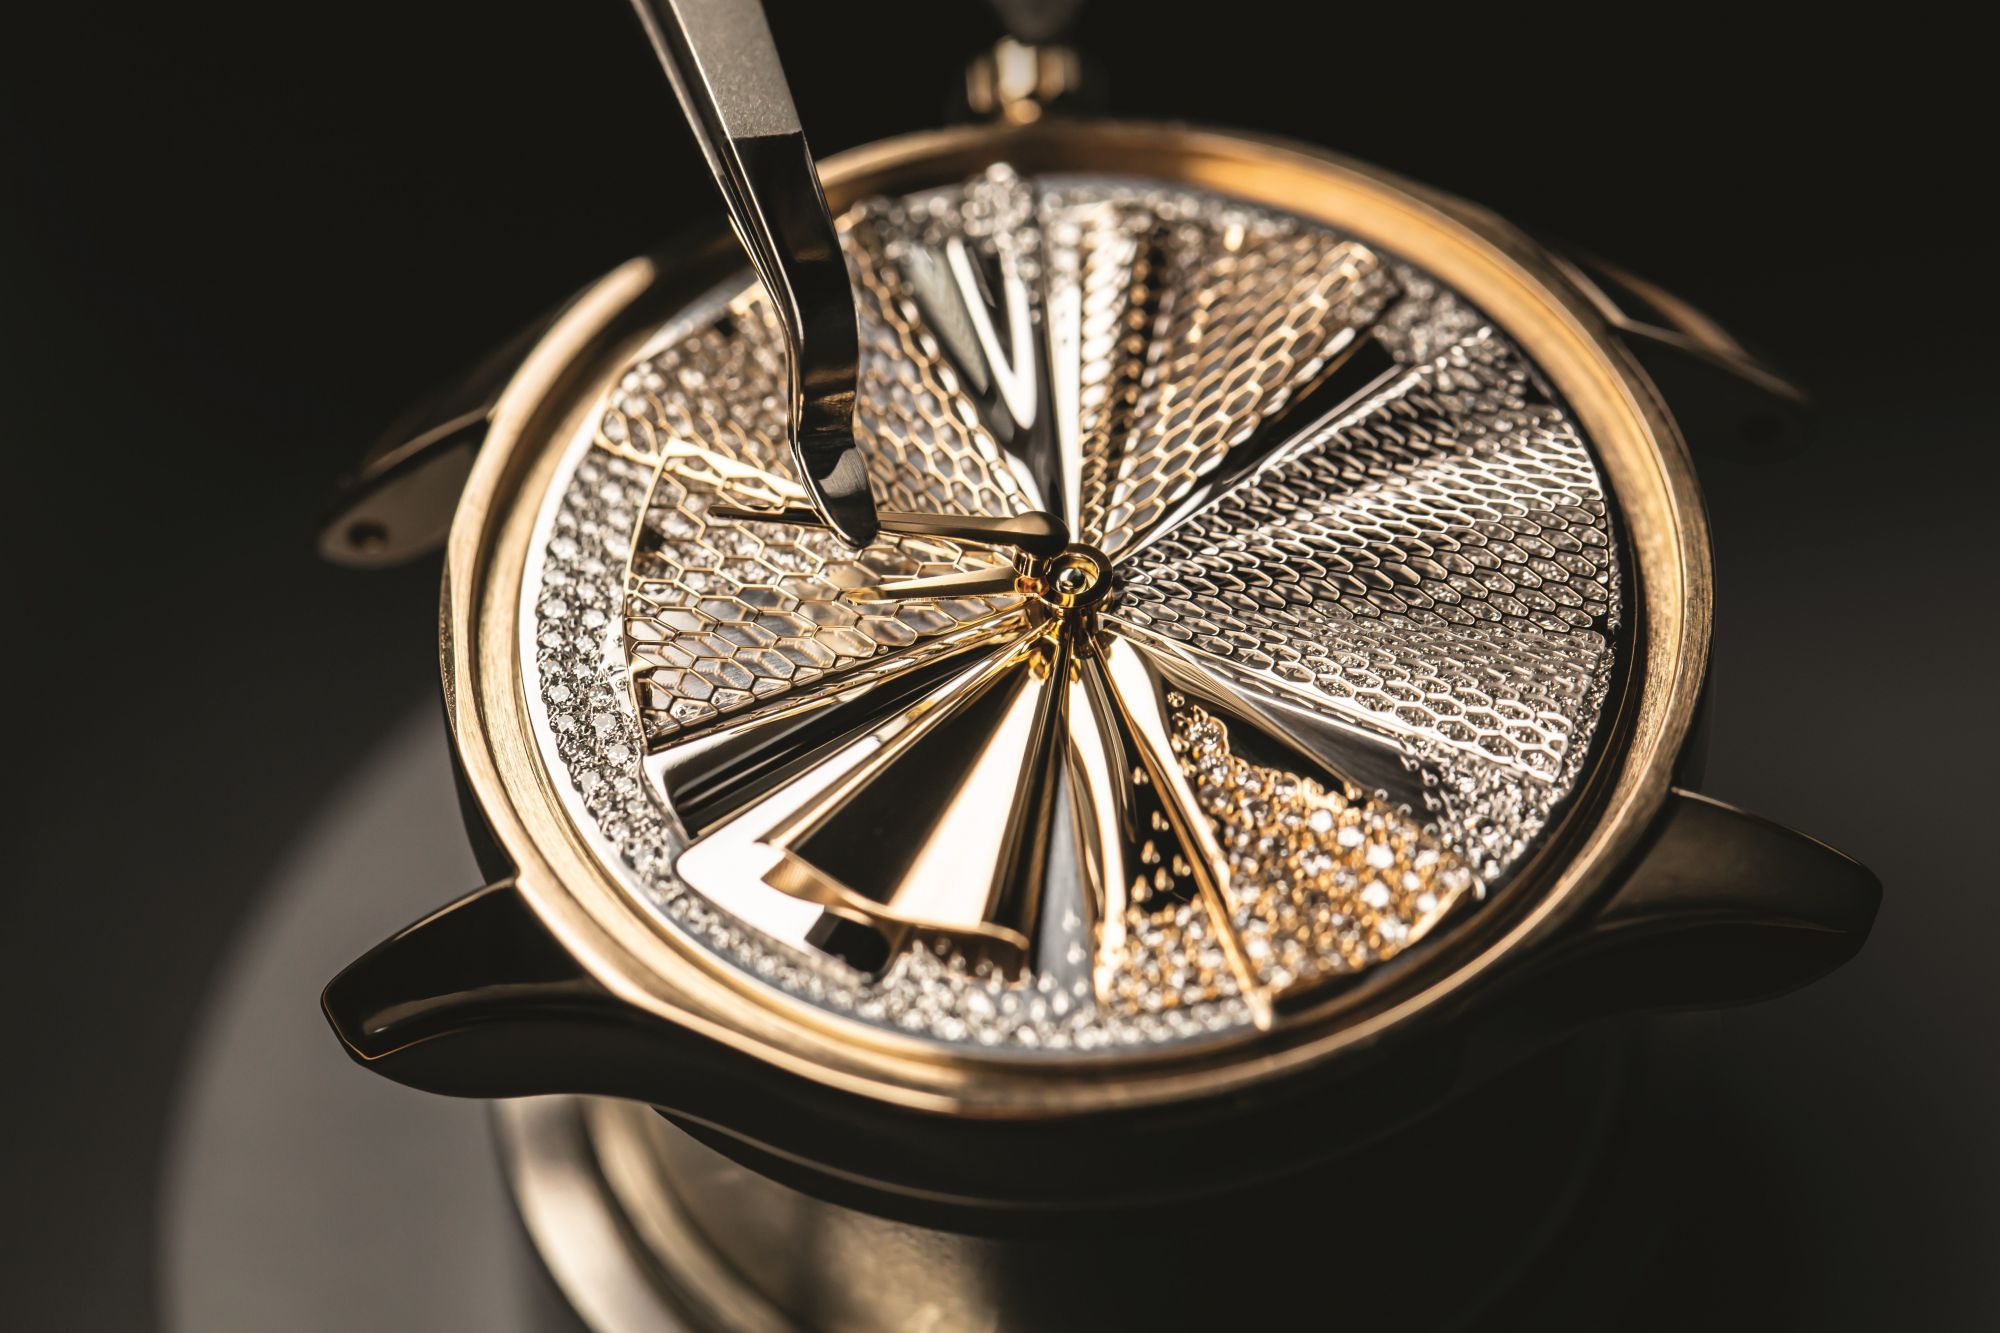 Dior Grand Soir Plissé Précieux腕錶錶盤上有著多層次的褶襉與鏤空網紋裝飾。